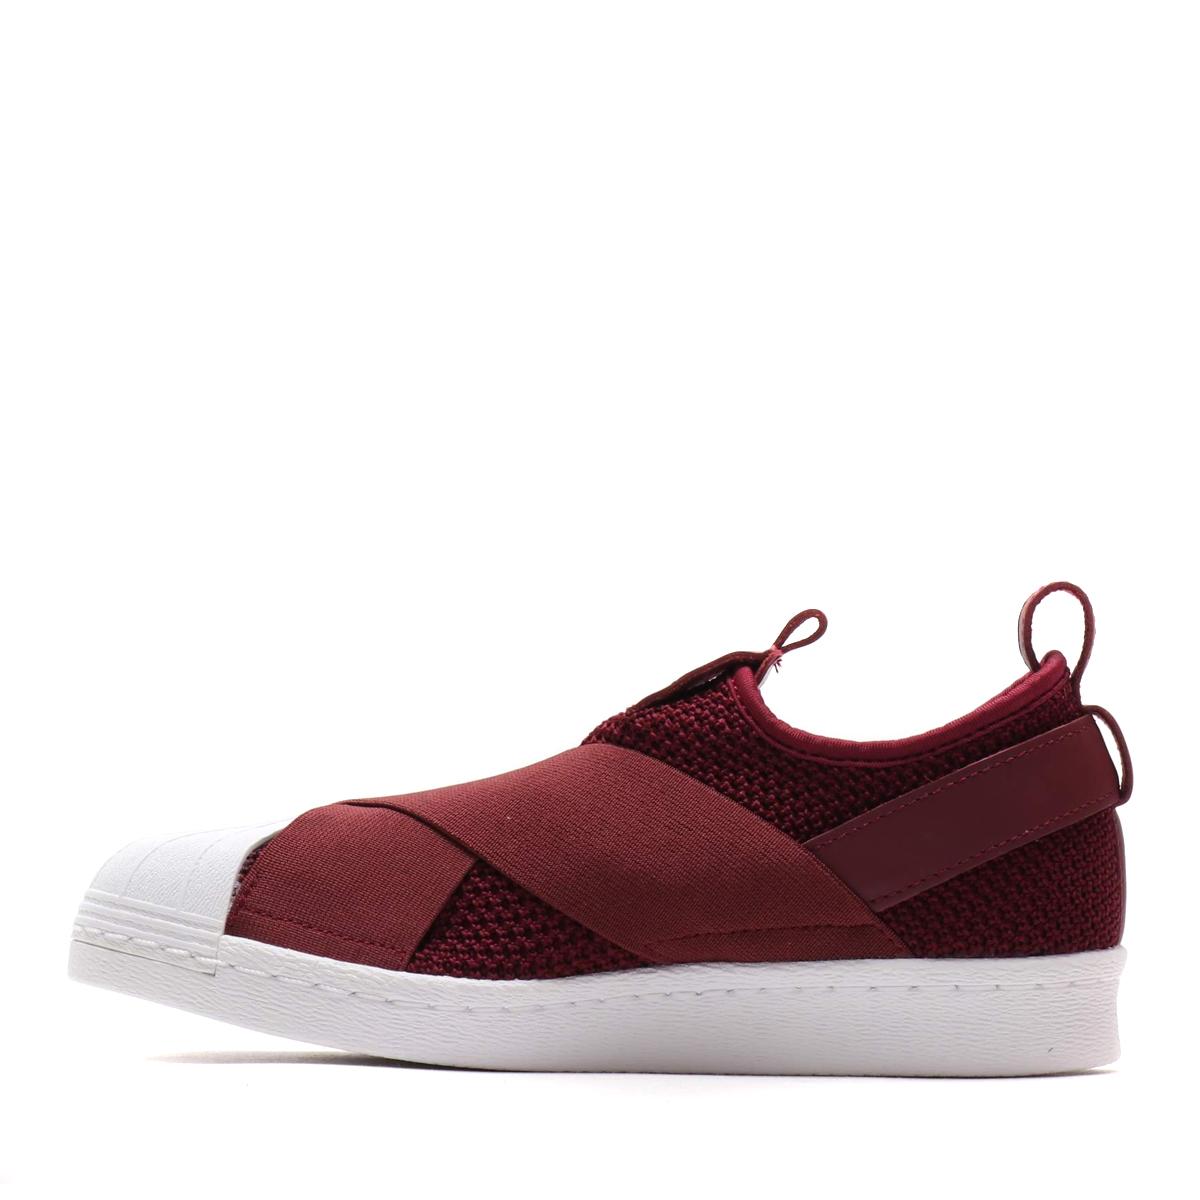 001f56b58562 adidas Originals SS Slip On W (Adidas originals superstar slip-ons W) RED  NIGHT RED NIGHT RUNNING WHITE 18FW-I